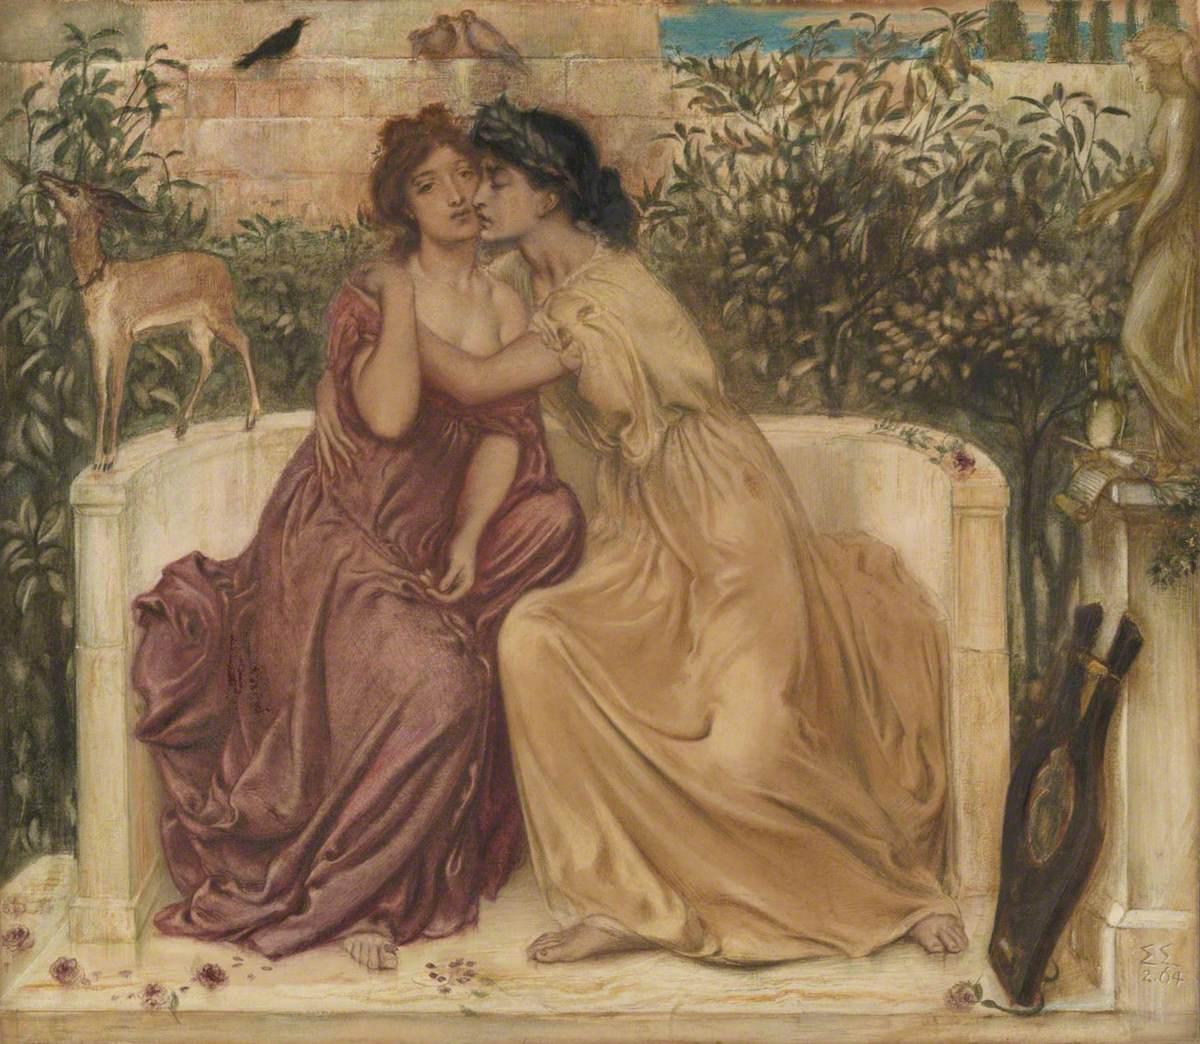 Sappho and Erinna in a Garden at Mytilene